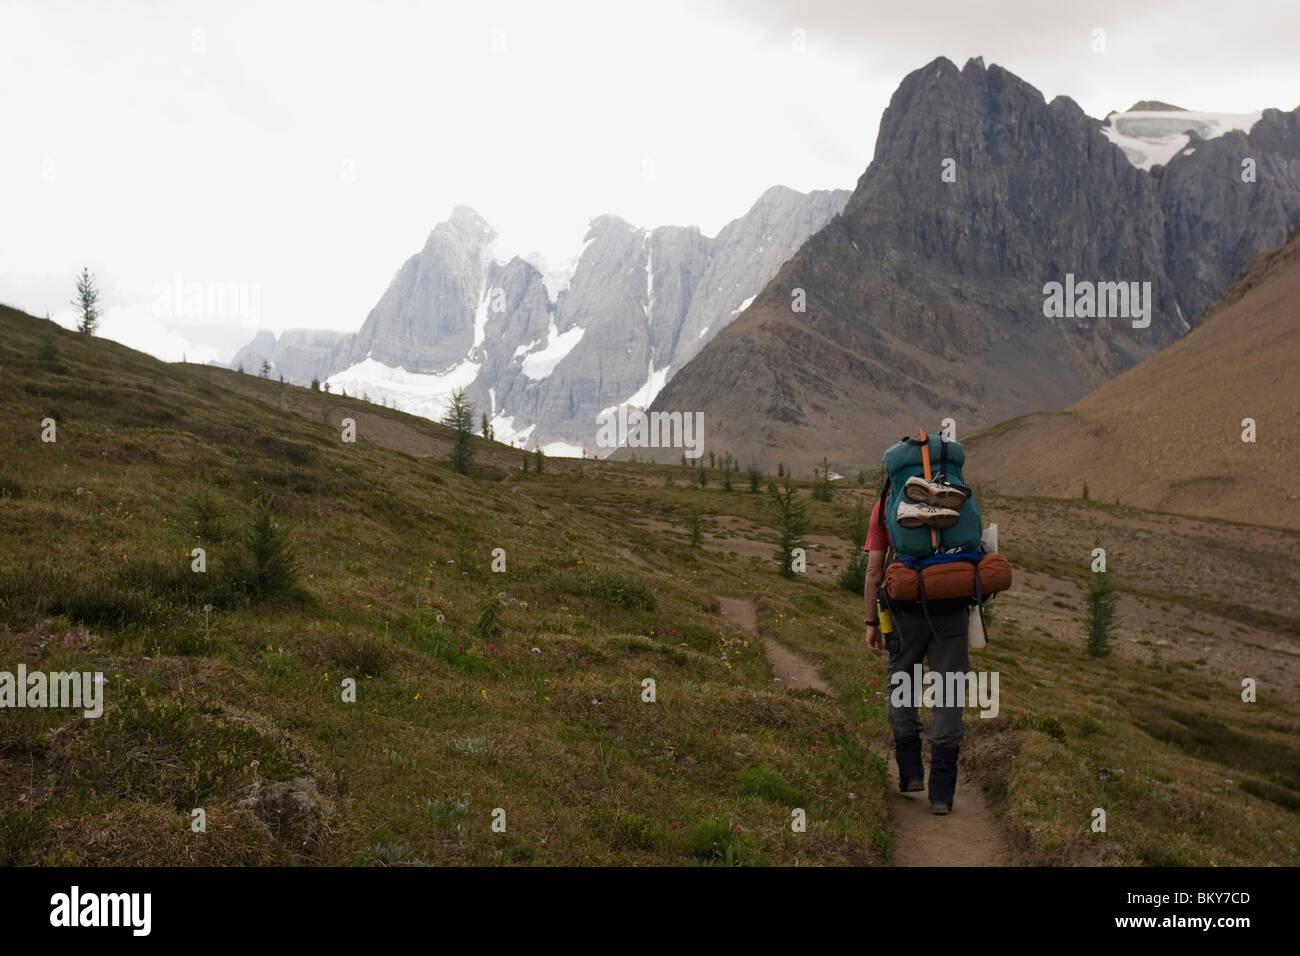 A male backpacker hiking the Rockwall Trail, Kootenay National Park. - Stock Image